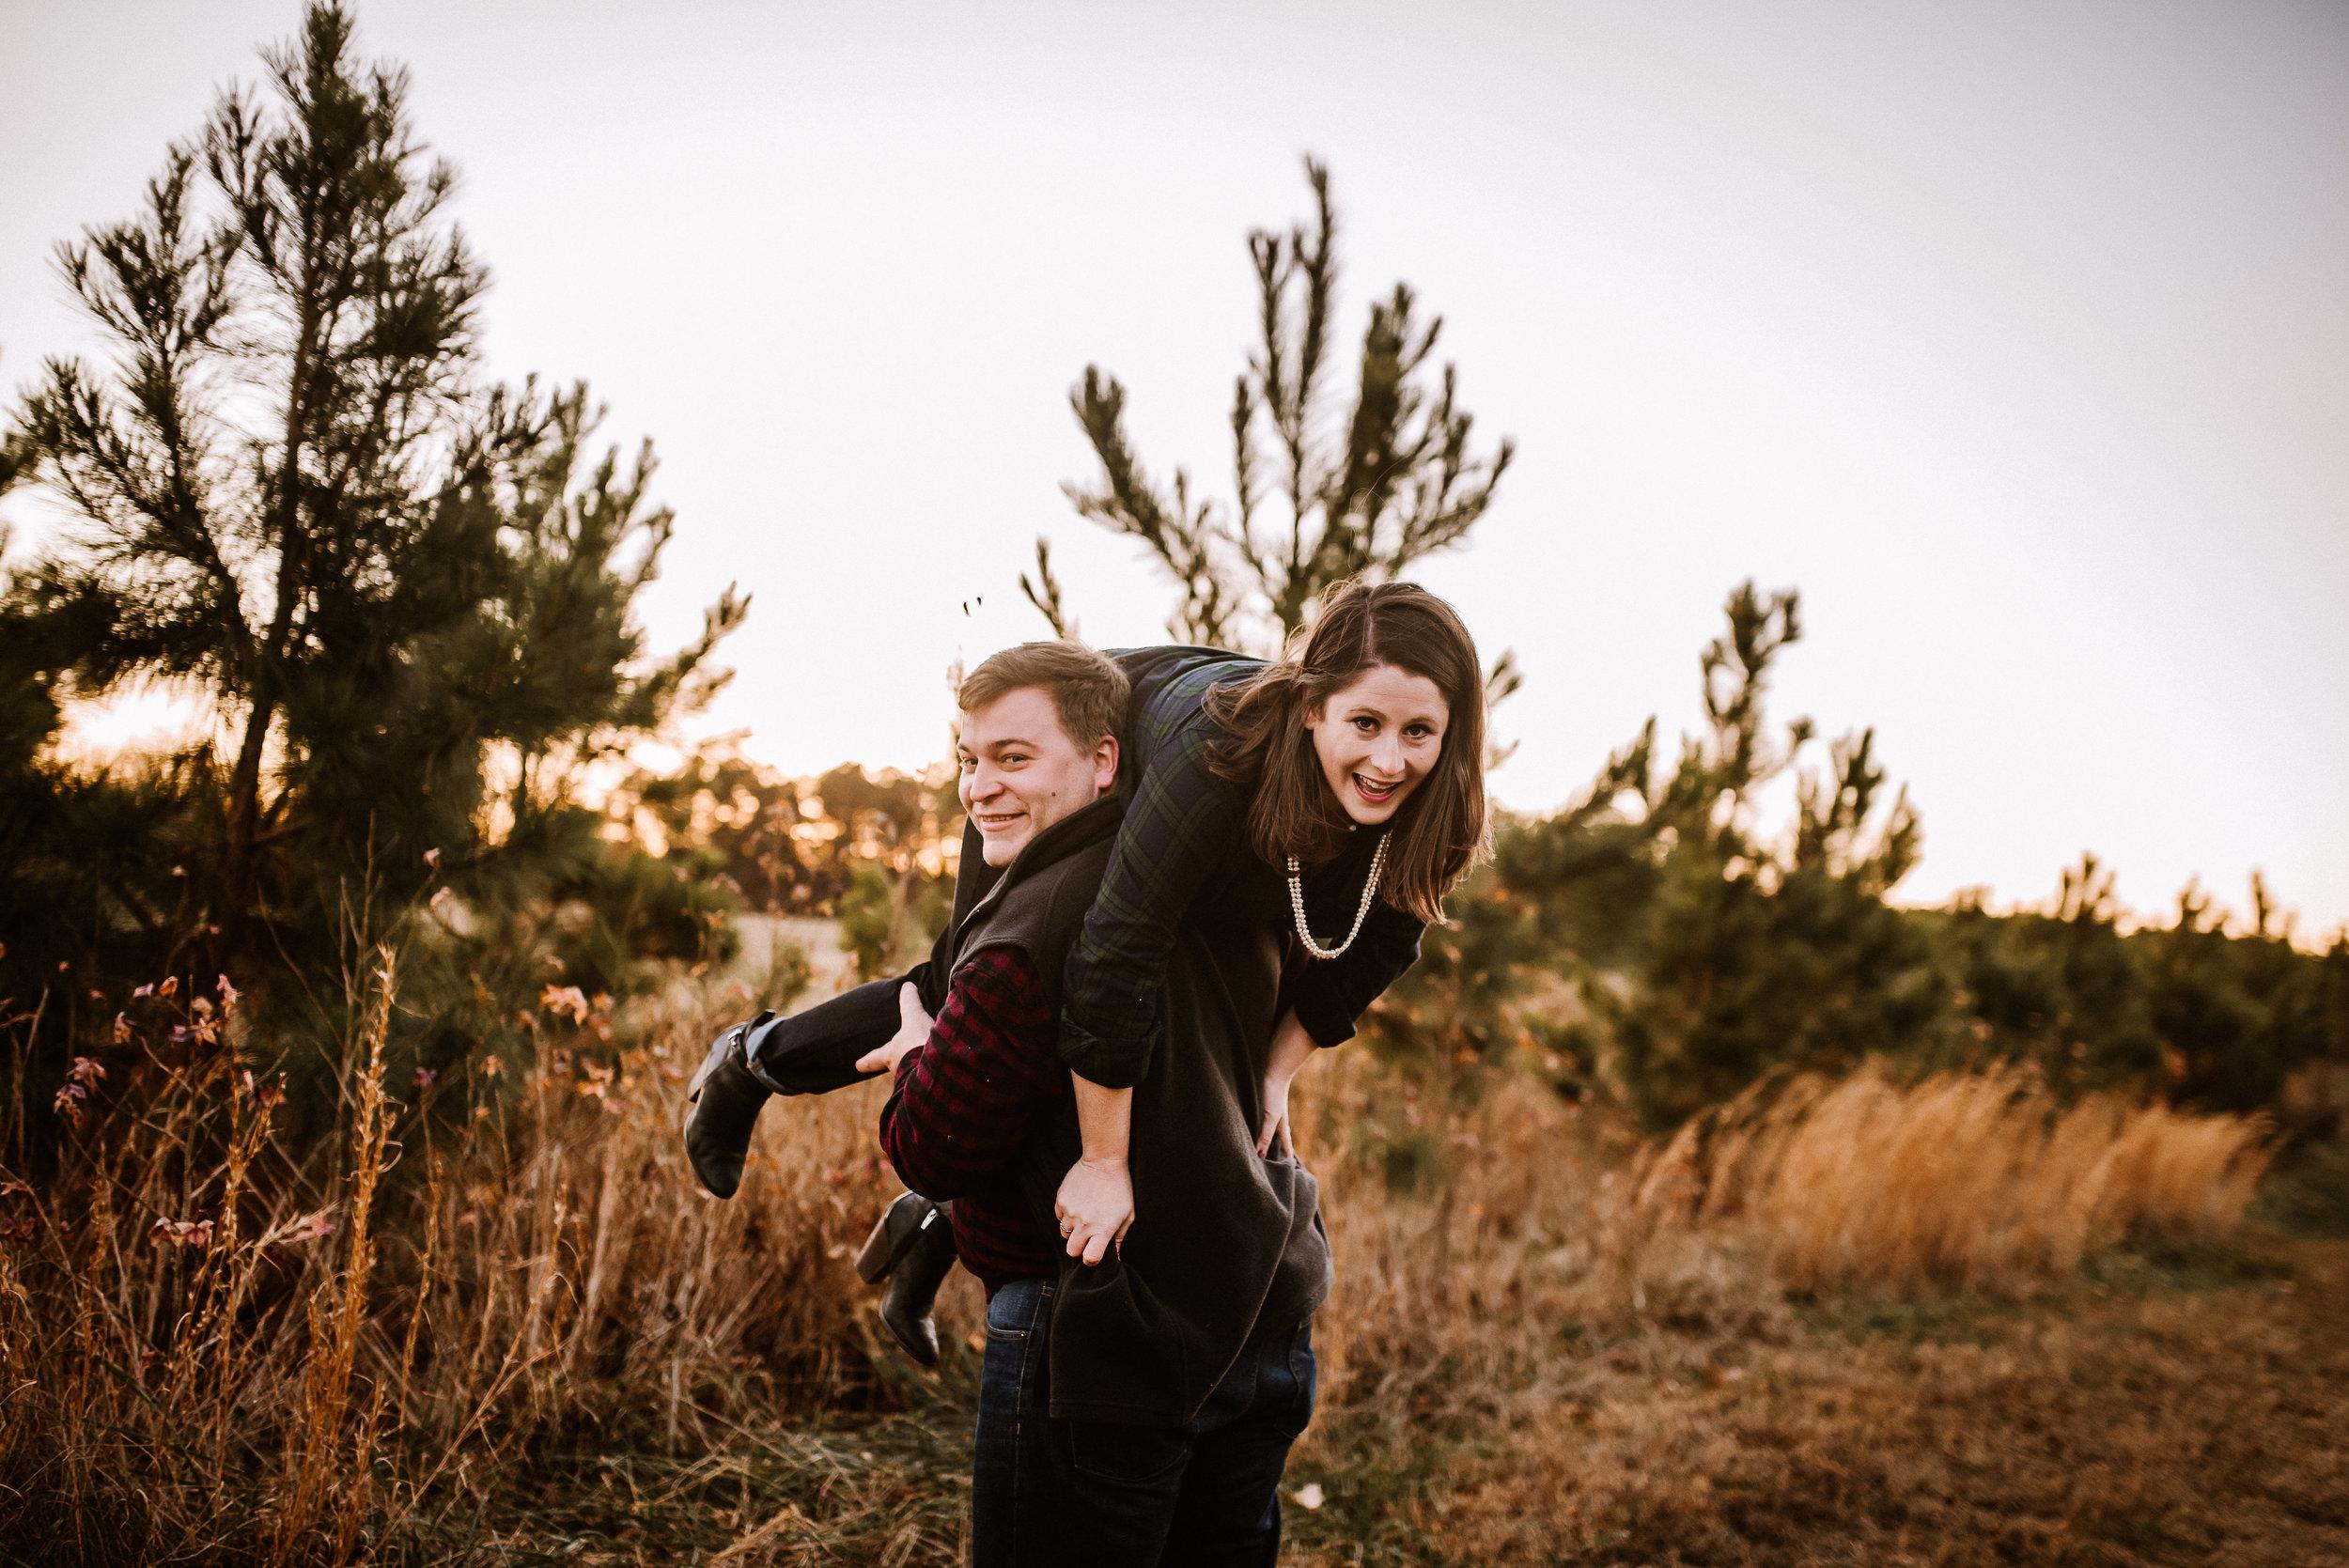 Carol+Jason_Engagement_Shelby_Farms_Ashley_Benham_Photography-46.jpg